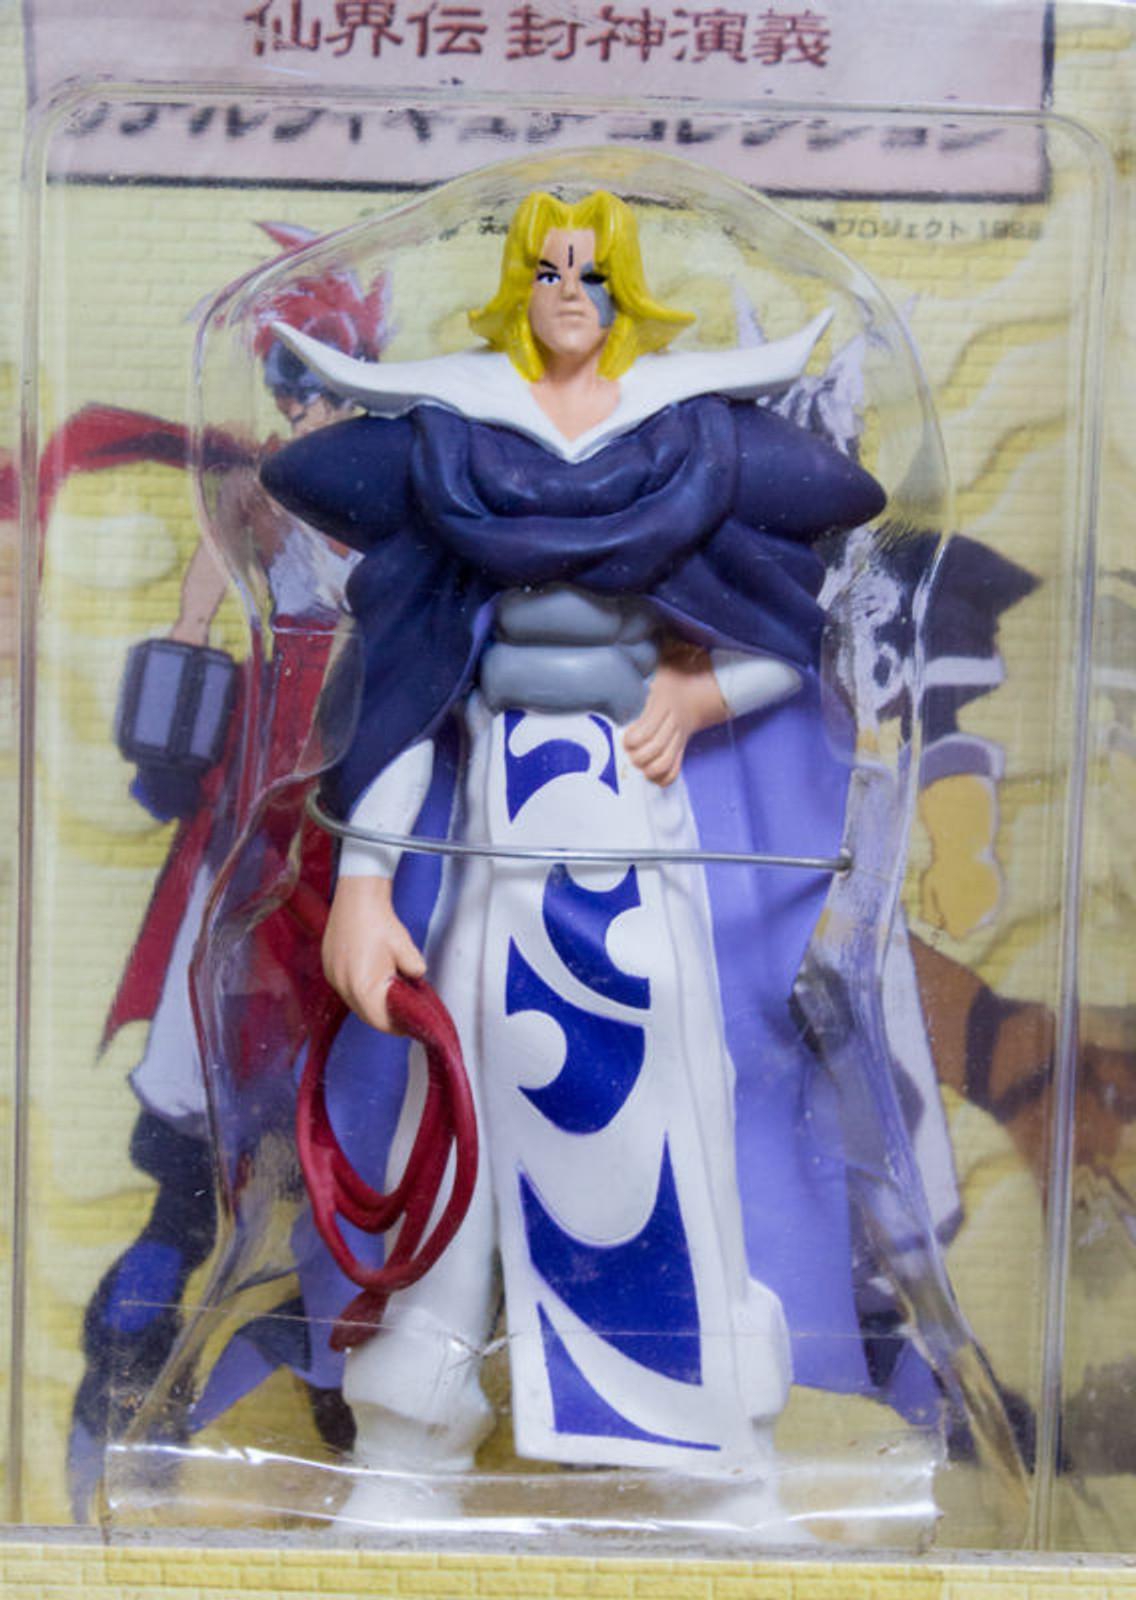 Senkaiden Hoshin Engi Bunchu Real Figure Collection Banpresto JAPAN ANIME MANGA